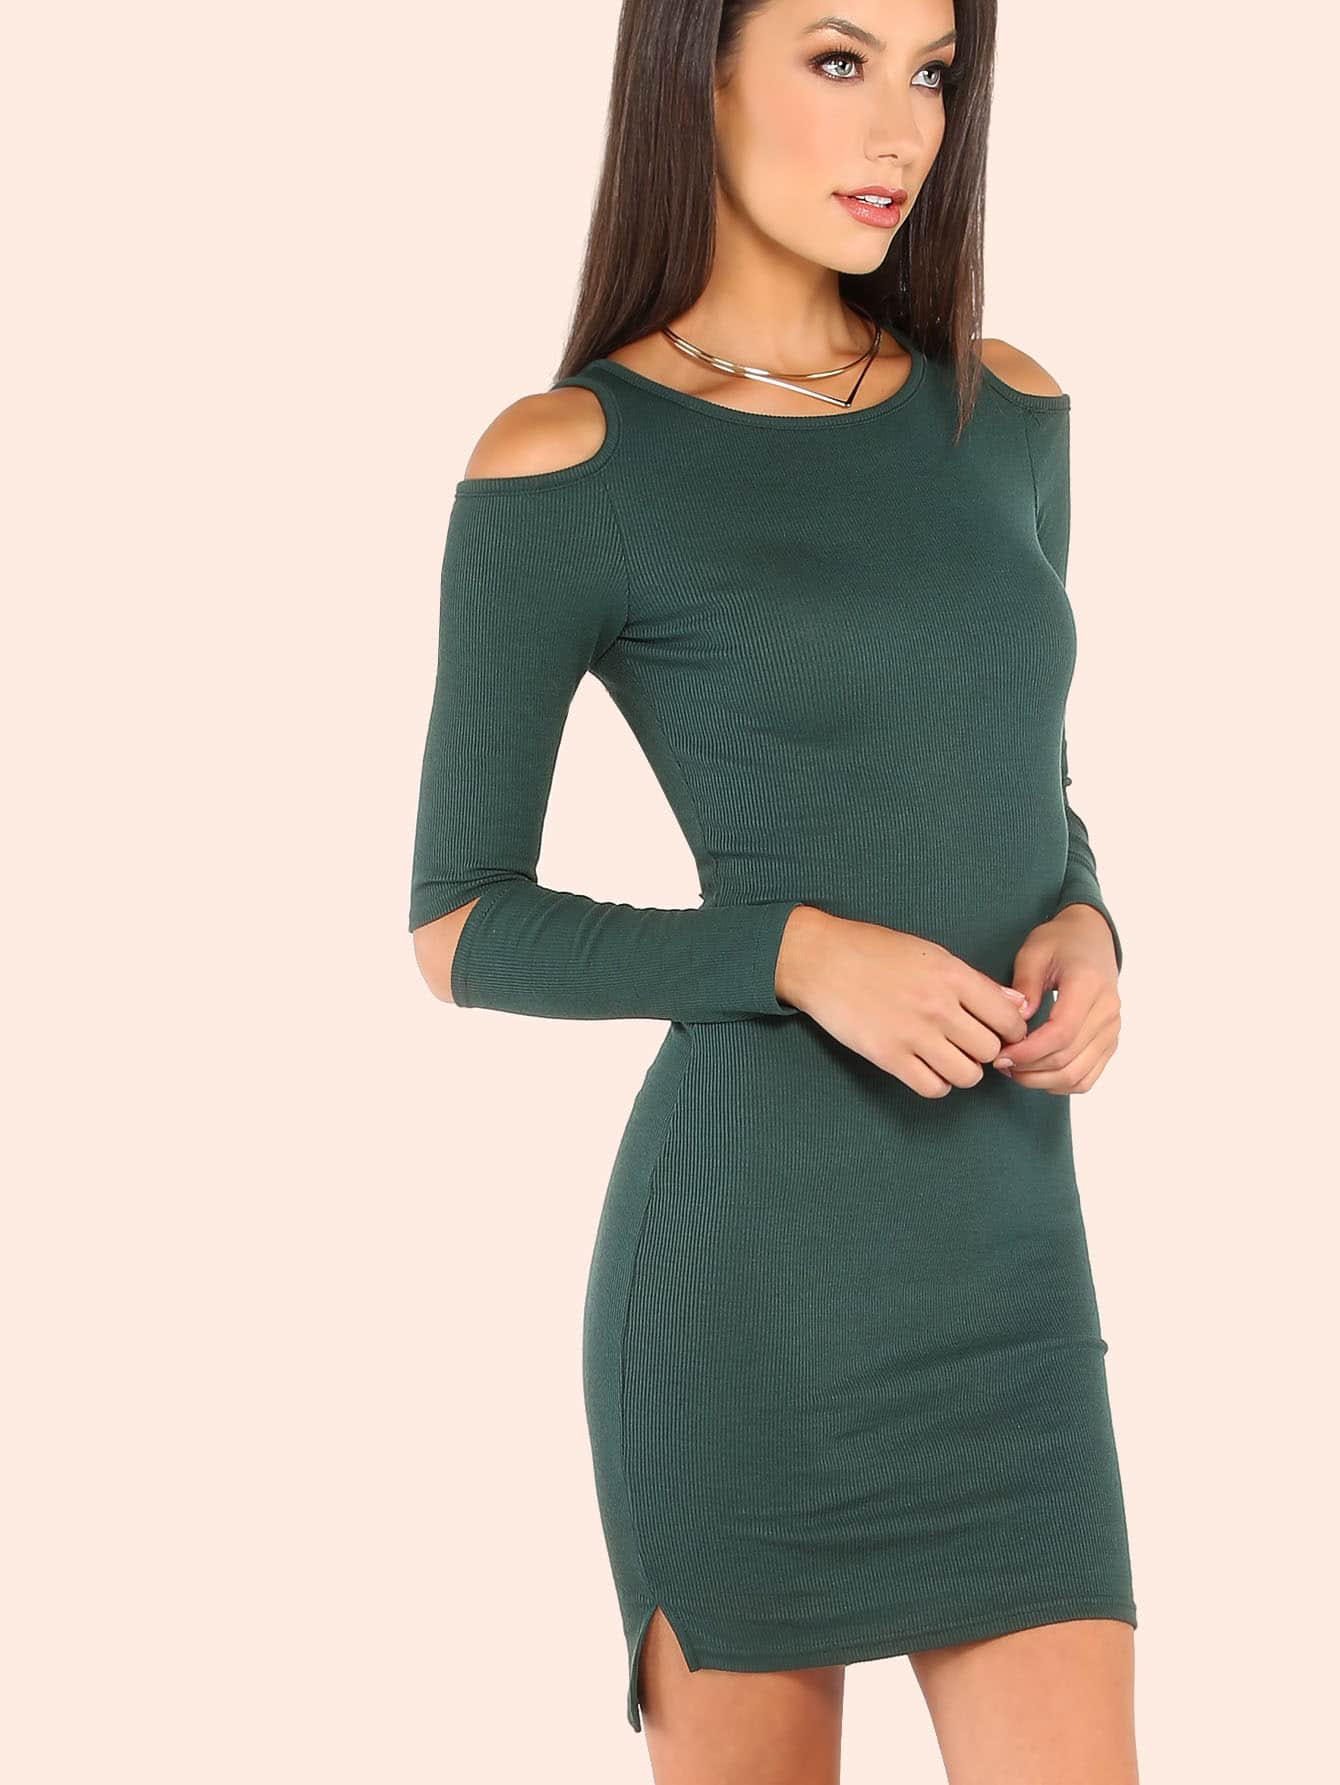 Rib Knit Cold Shoulder Elbow Cutout Dress HUNTER GREEN mmcdress-d350-huntergreen